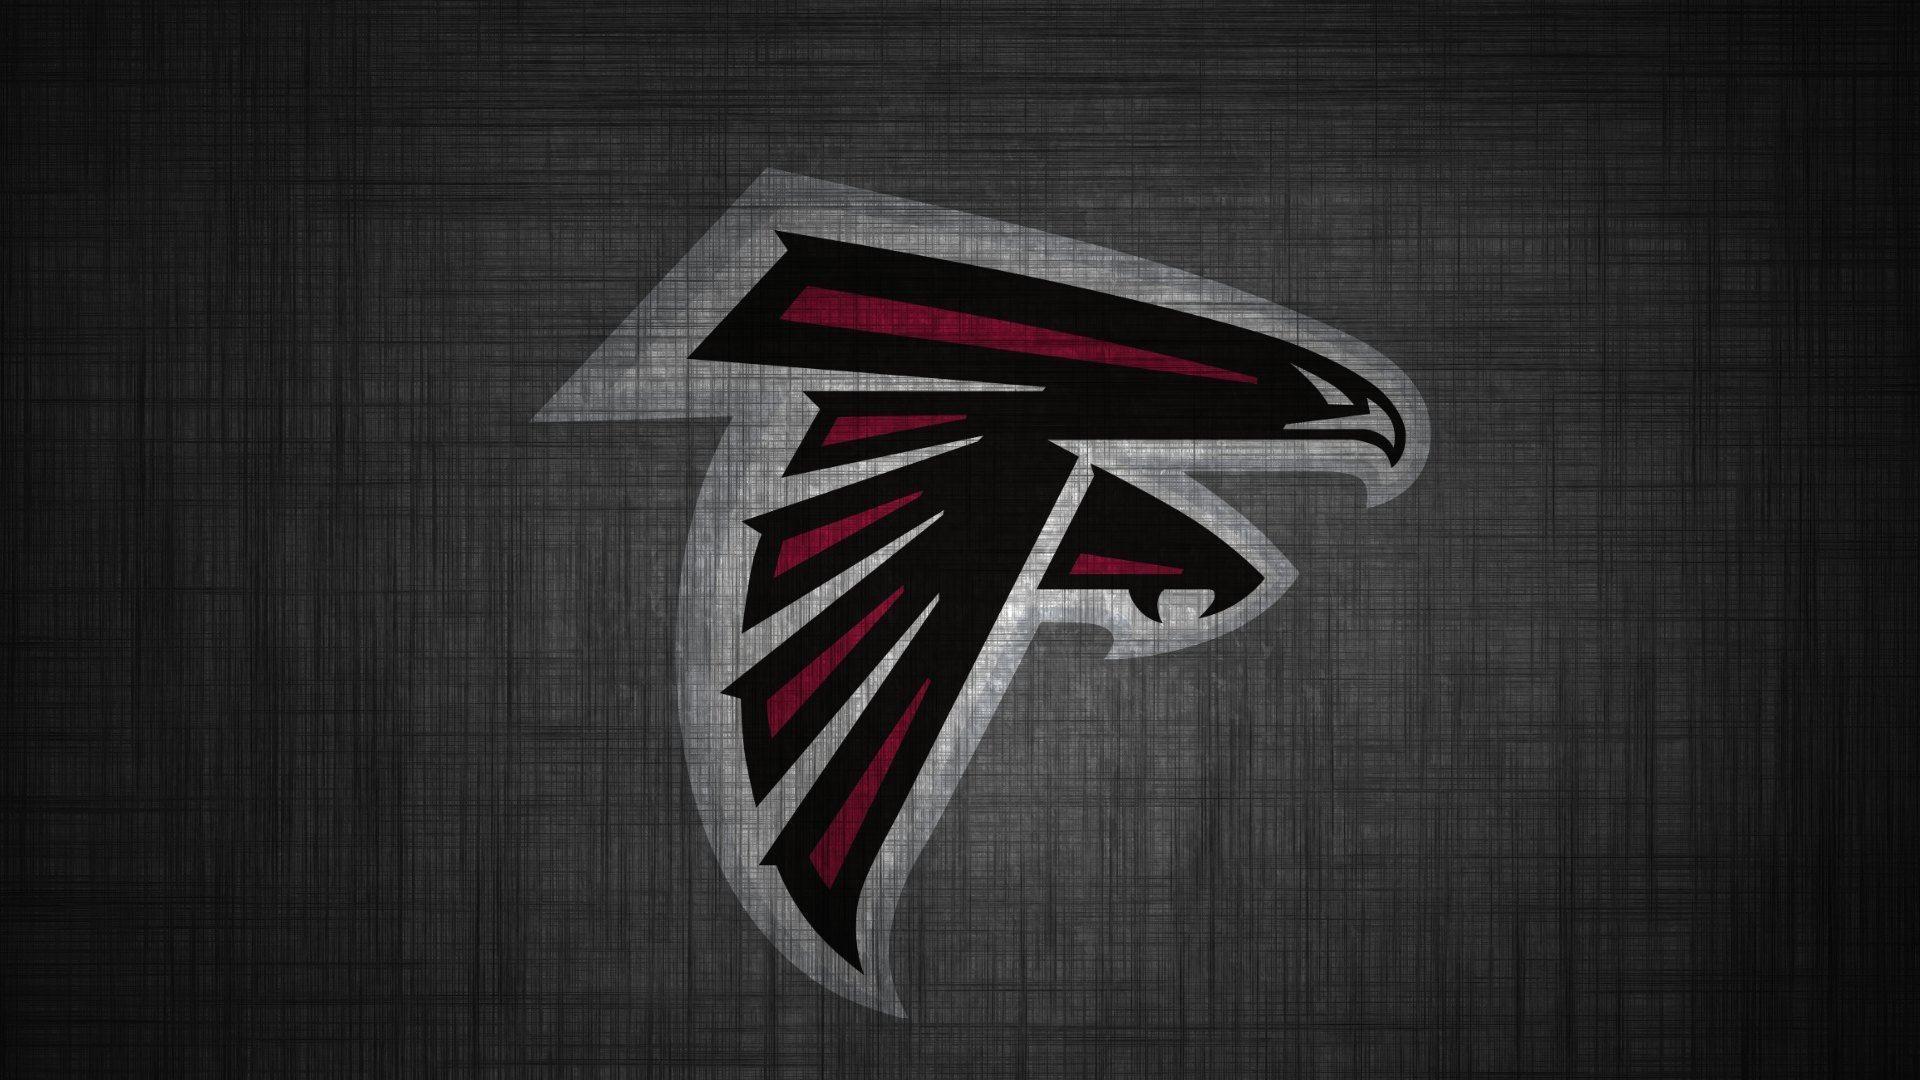 Nfl Wallpapers Atlanta Falcons Background Atlanta Falcons Wallpaper Atlanta Falcons